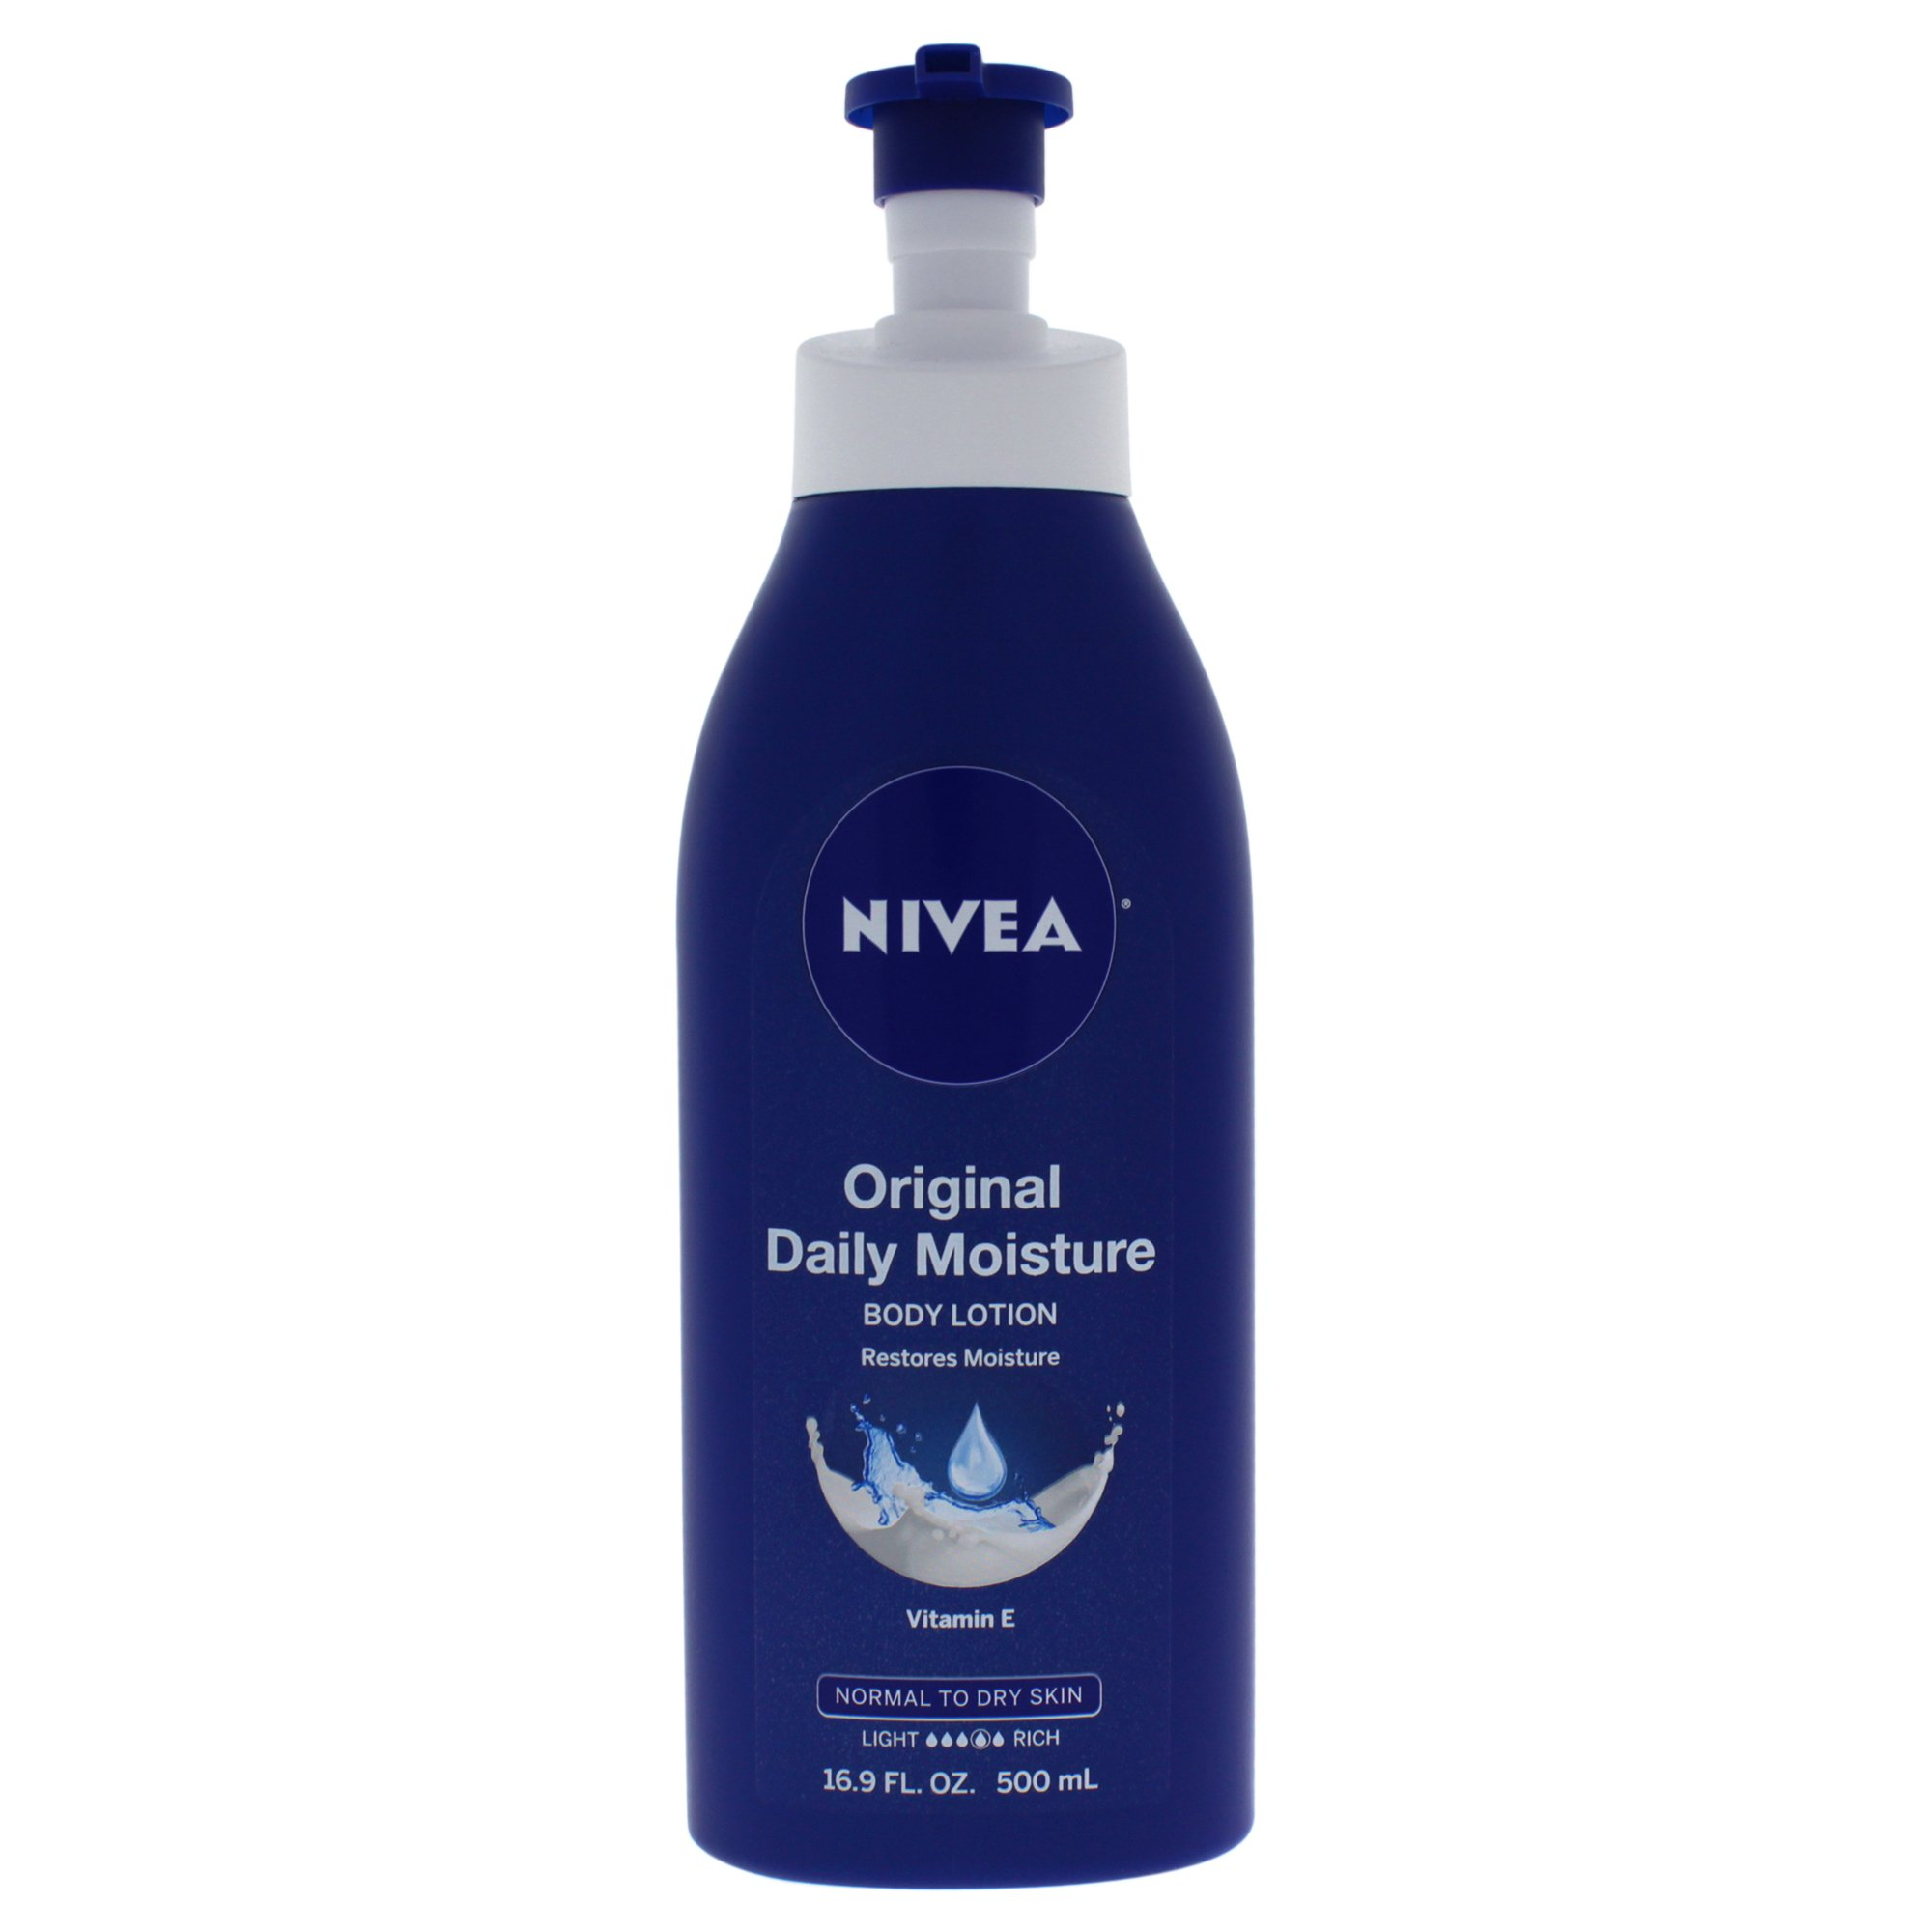 NIVEA Original Daily Moisture Body Lotion 16.9 Fluid Ounce